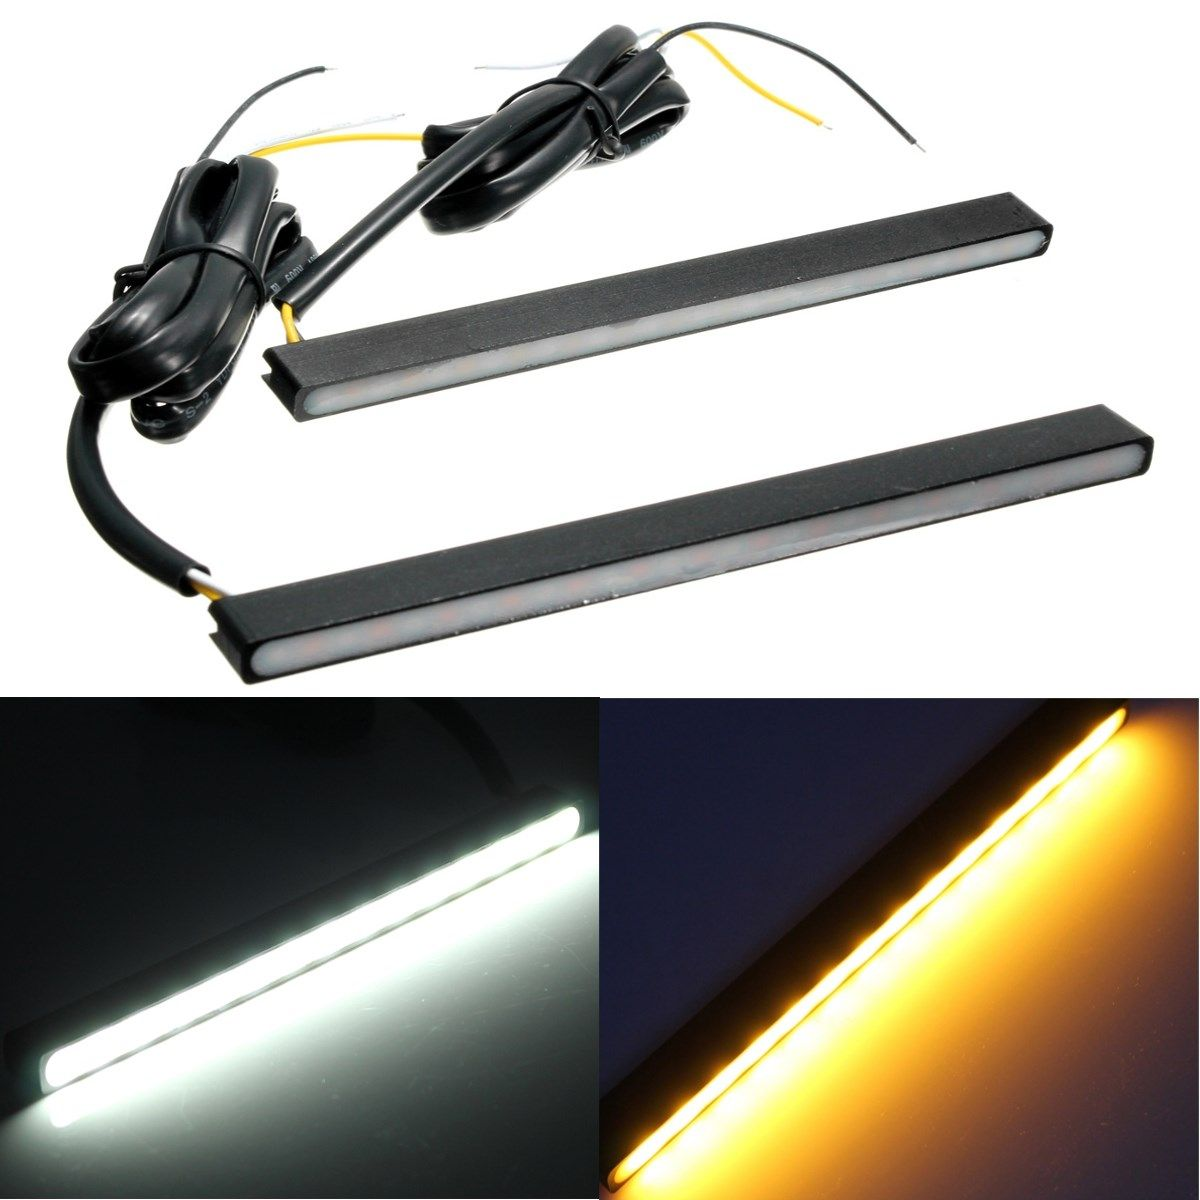 Audew 12V 2Pcs Universal 15LED Daytime Running Light DRL Turn Signal Indicator Light White & Amber